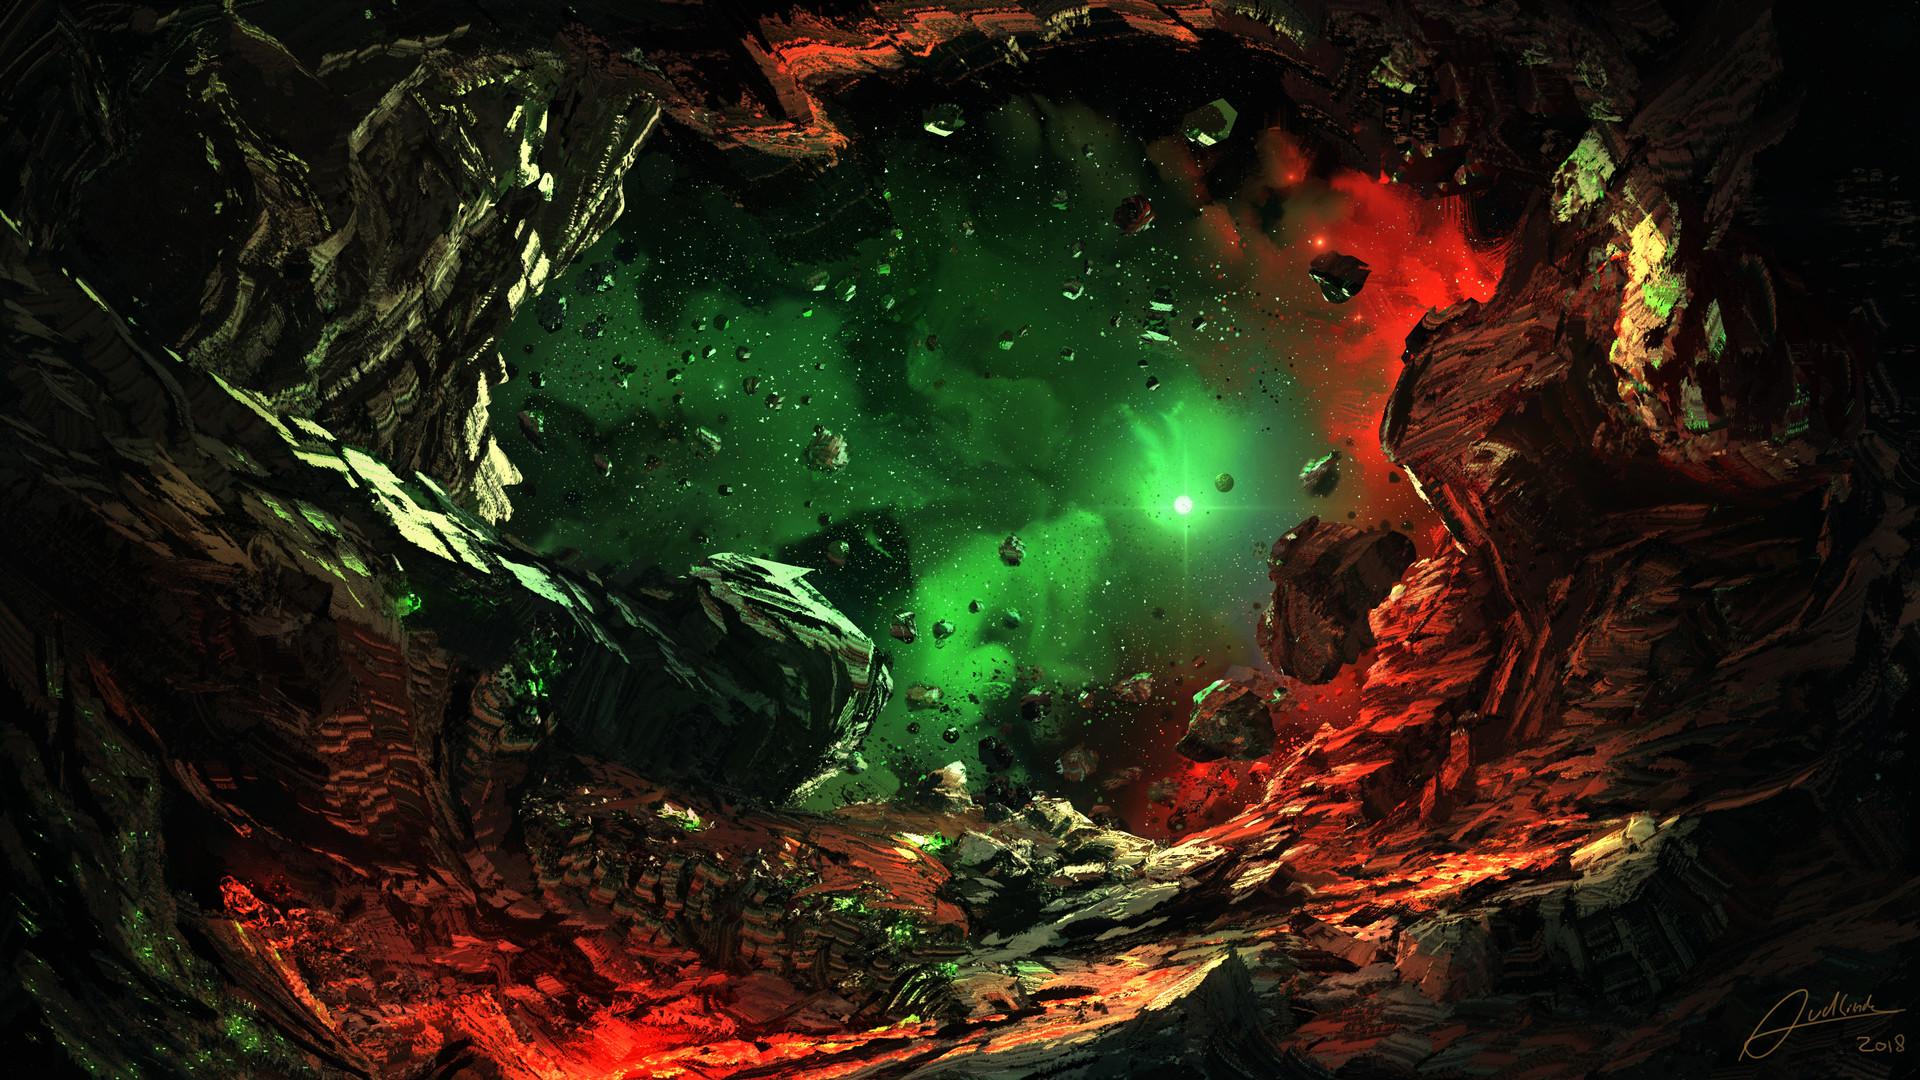 alex-van-der-linde-170-space-cave-by-alex-van-der-linde.jpg?1544480224